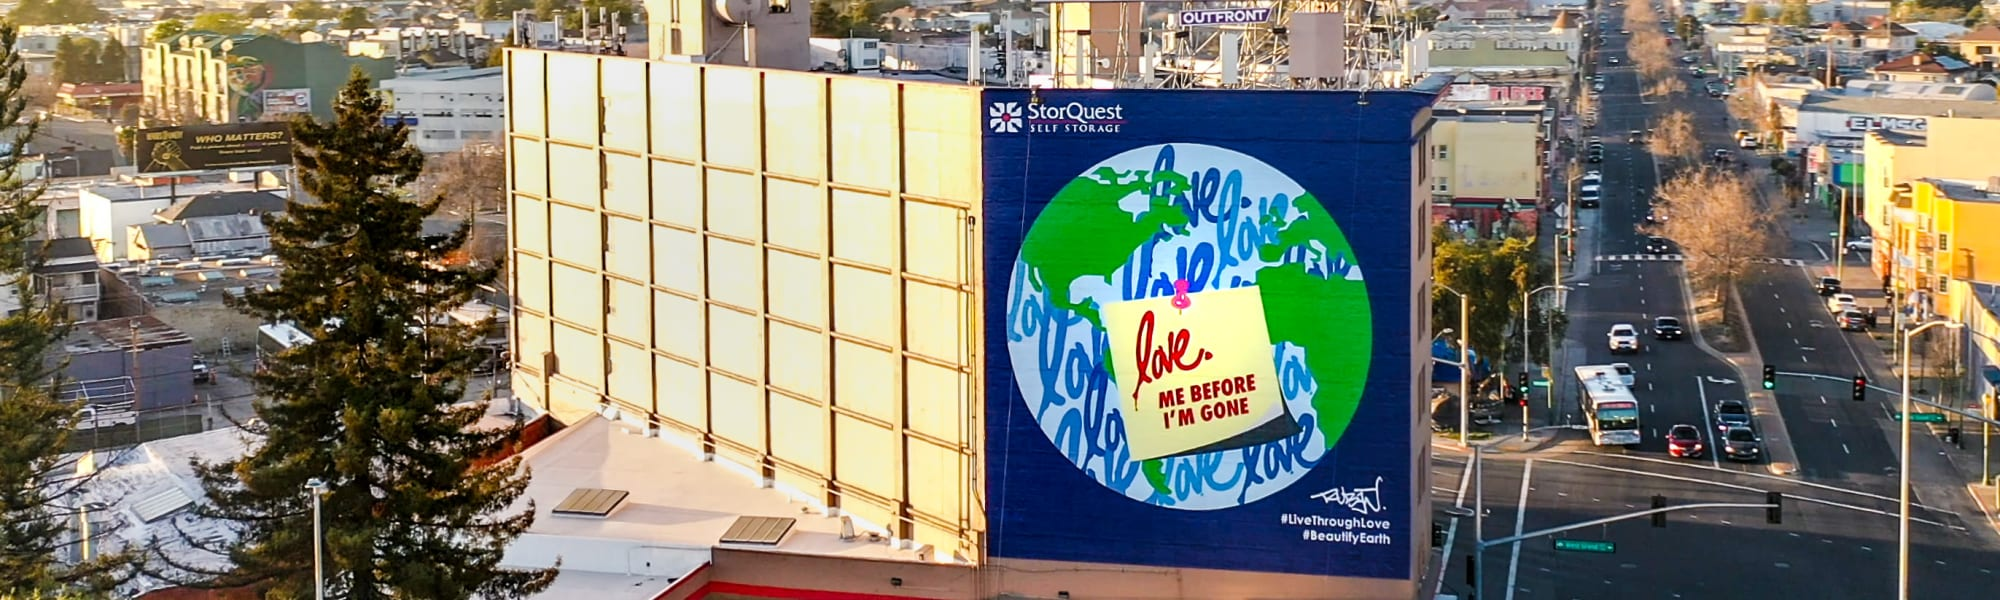 Self storage in Oakland CA